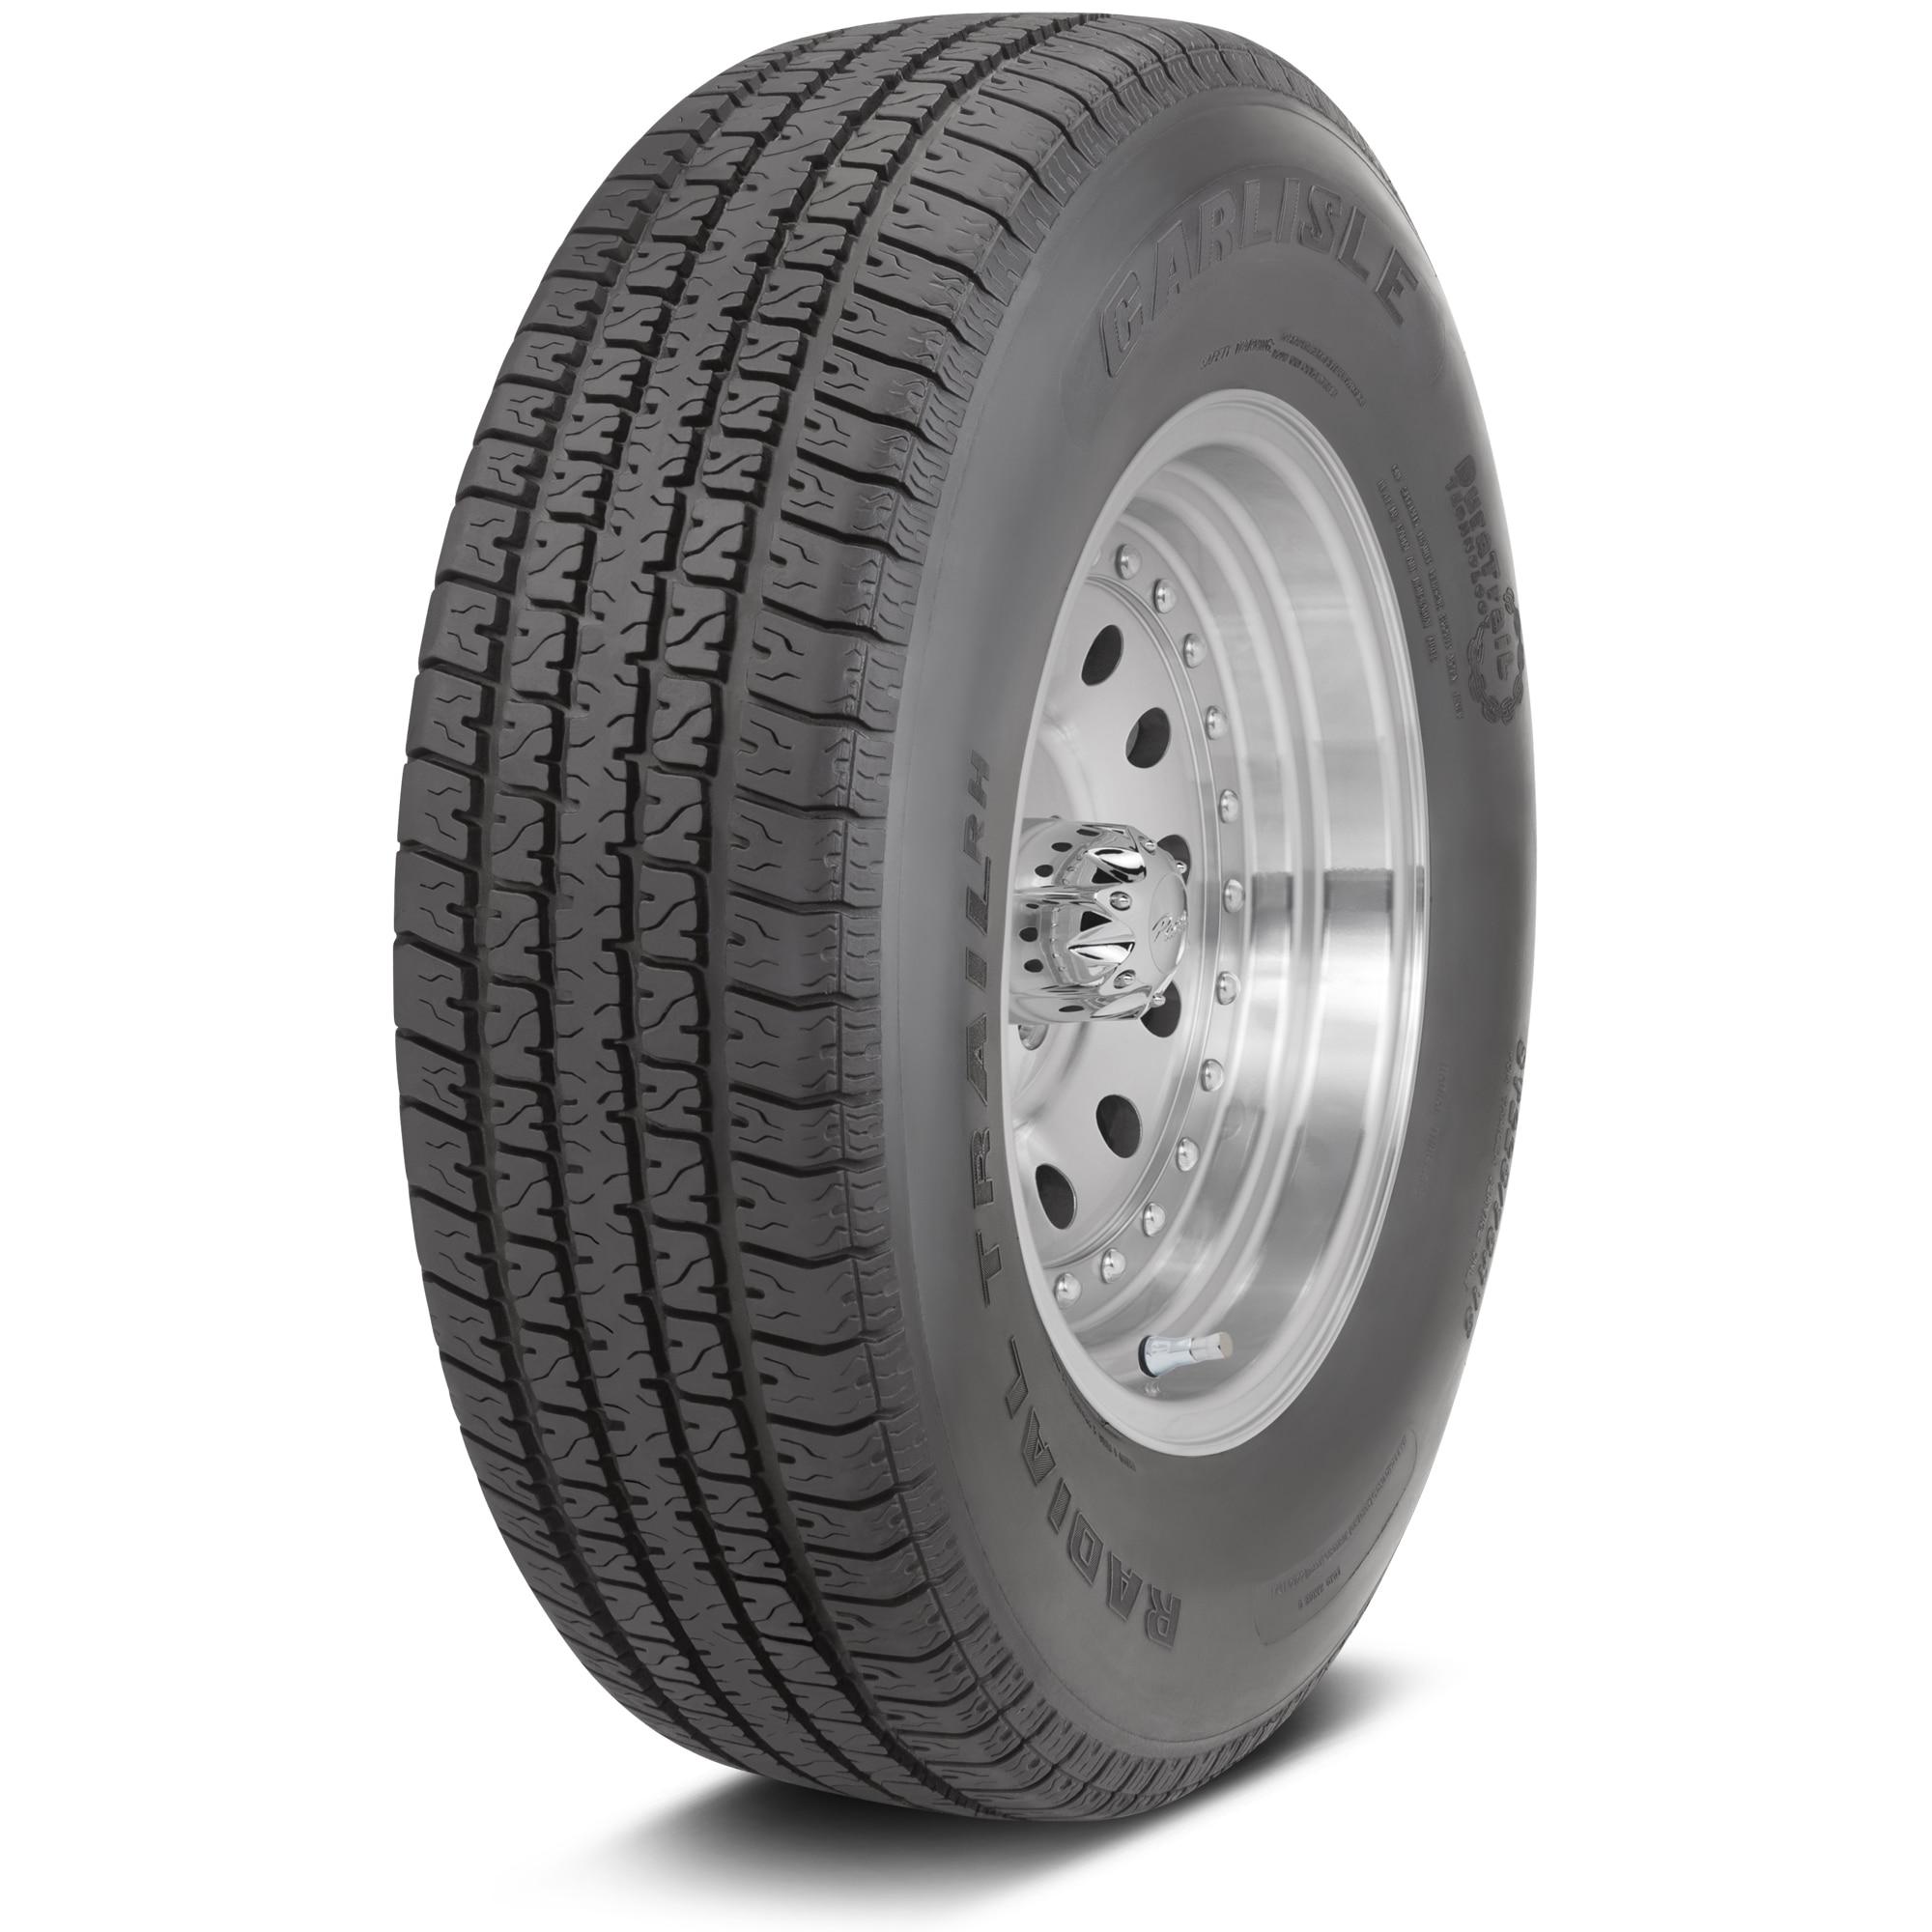 Carlisle Radial Trail RH Trailer Tire - ST145R12 LRE/10 p...